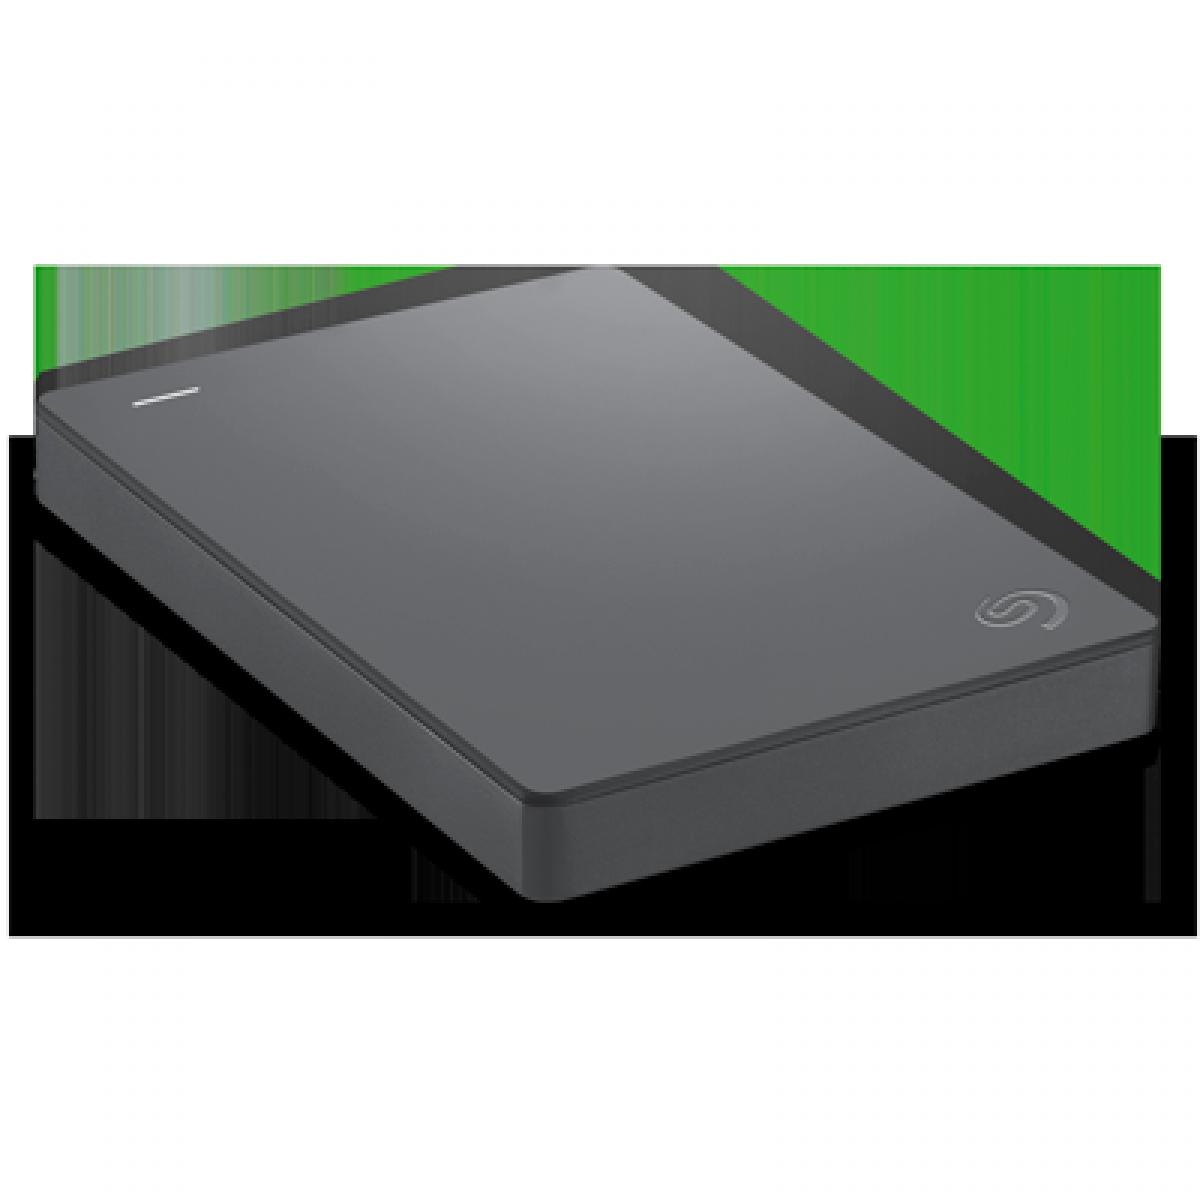 HD Externo Seagate Basic, 1TB, USB 3.0, Black, STJL1000400